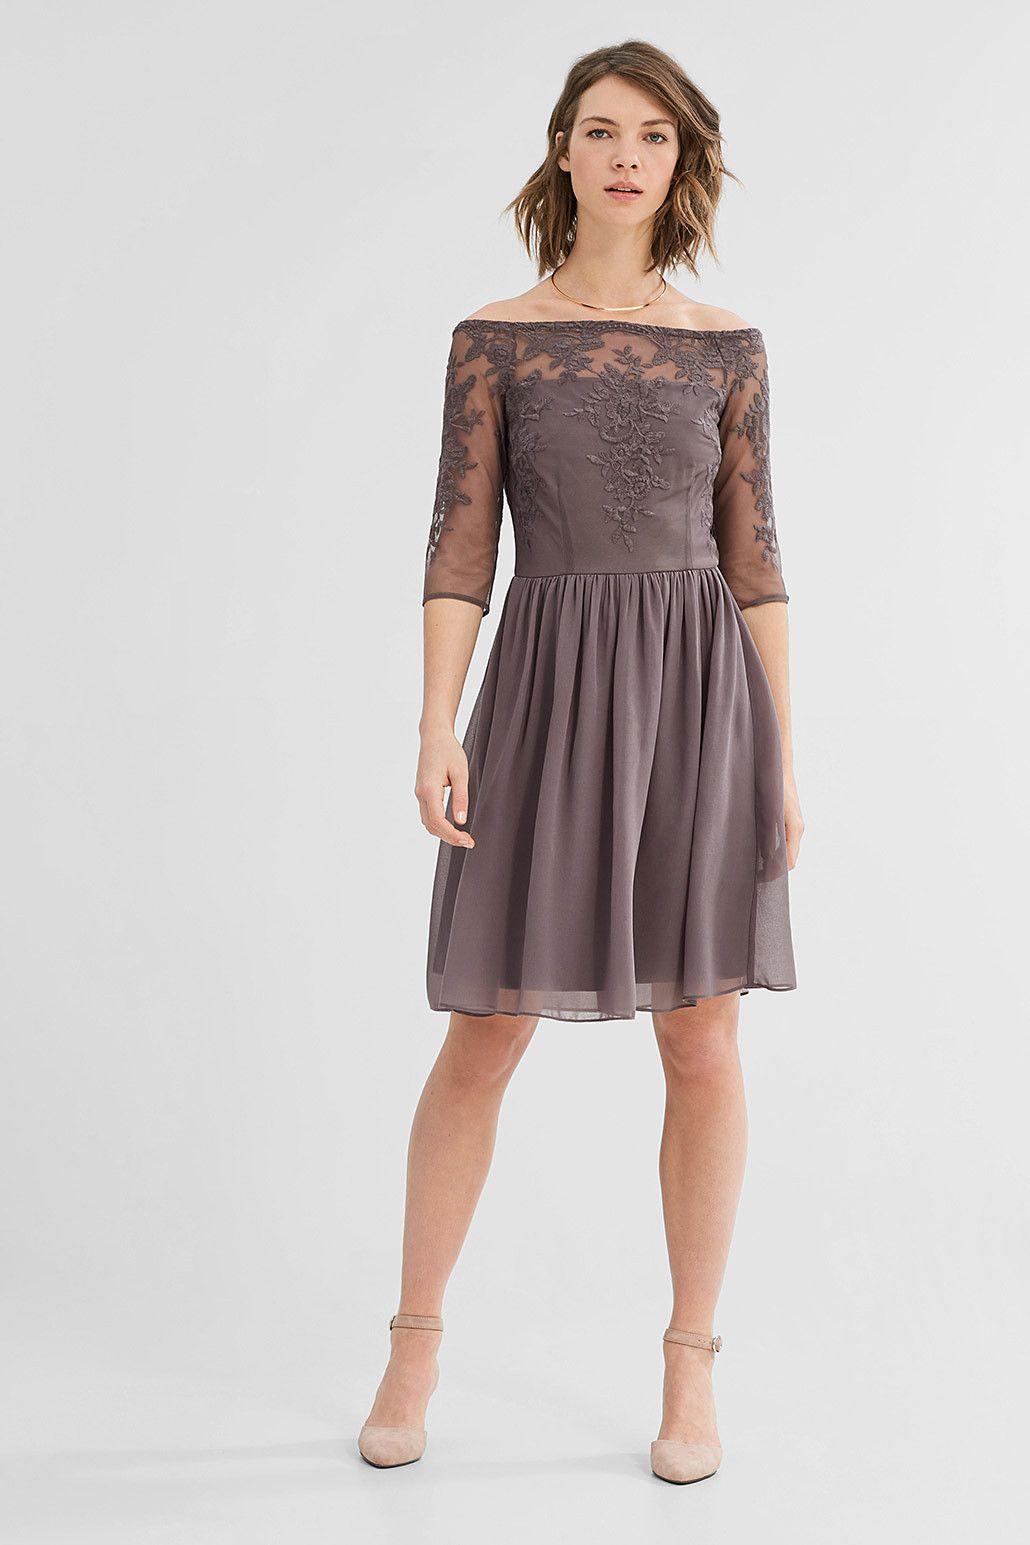 Kleid Shoulder Online Esprit Aus Besticktem Shop Tüll Im Off tQdChrs